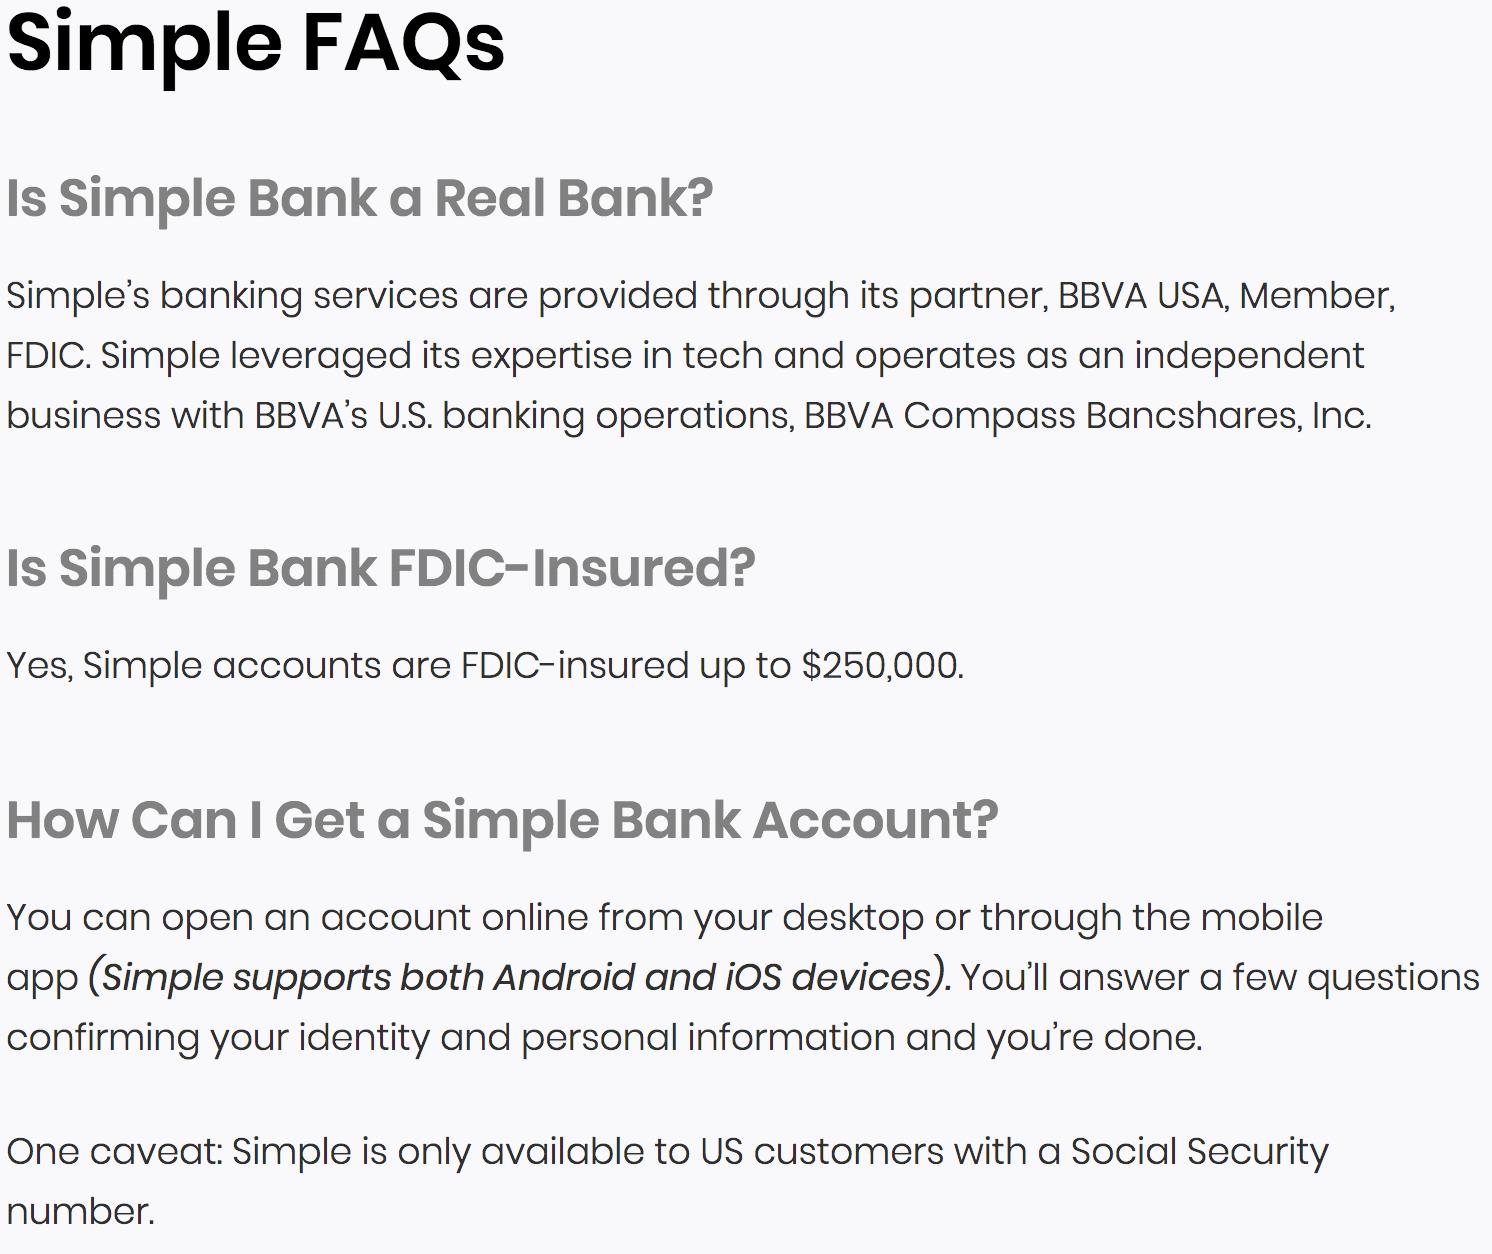 simple bank faq example